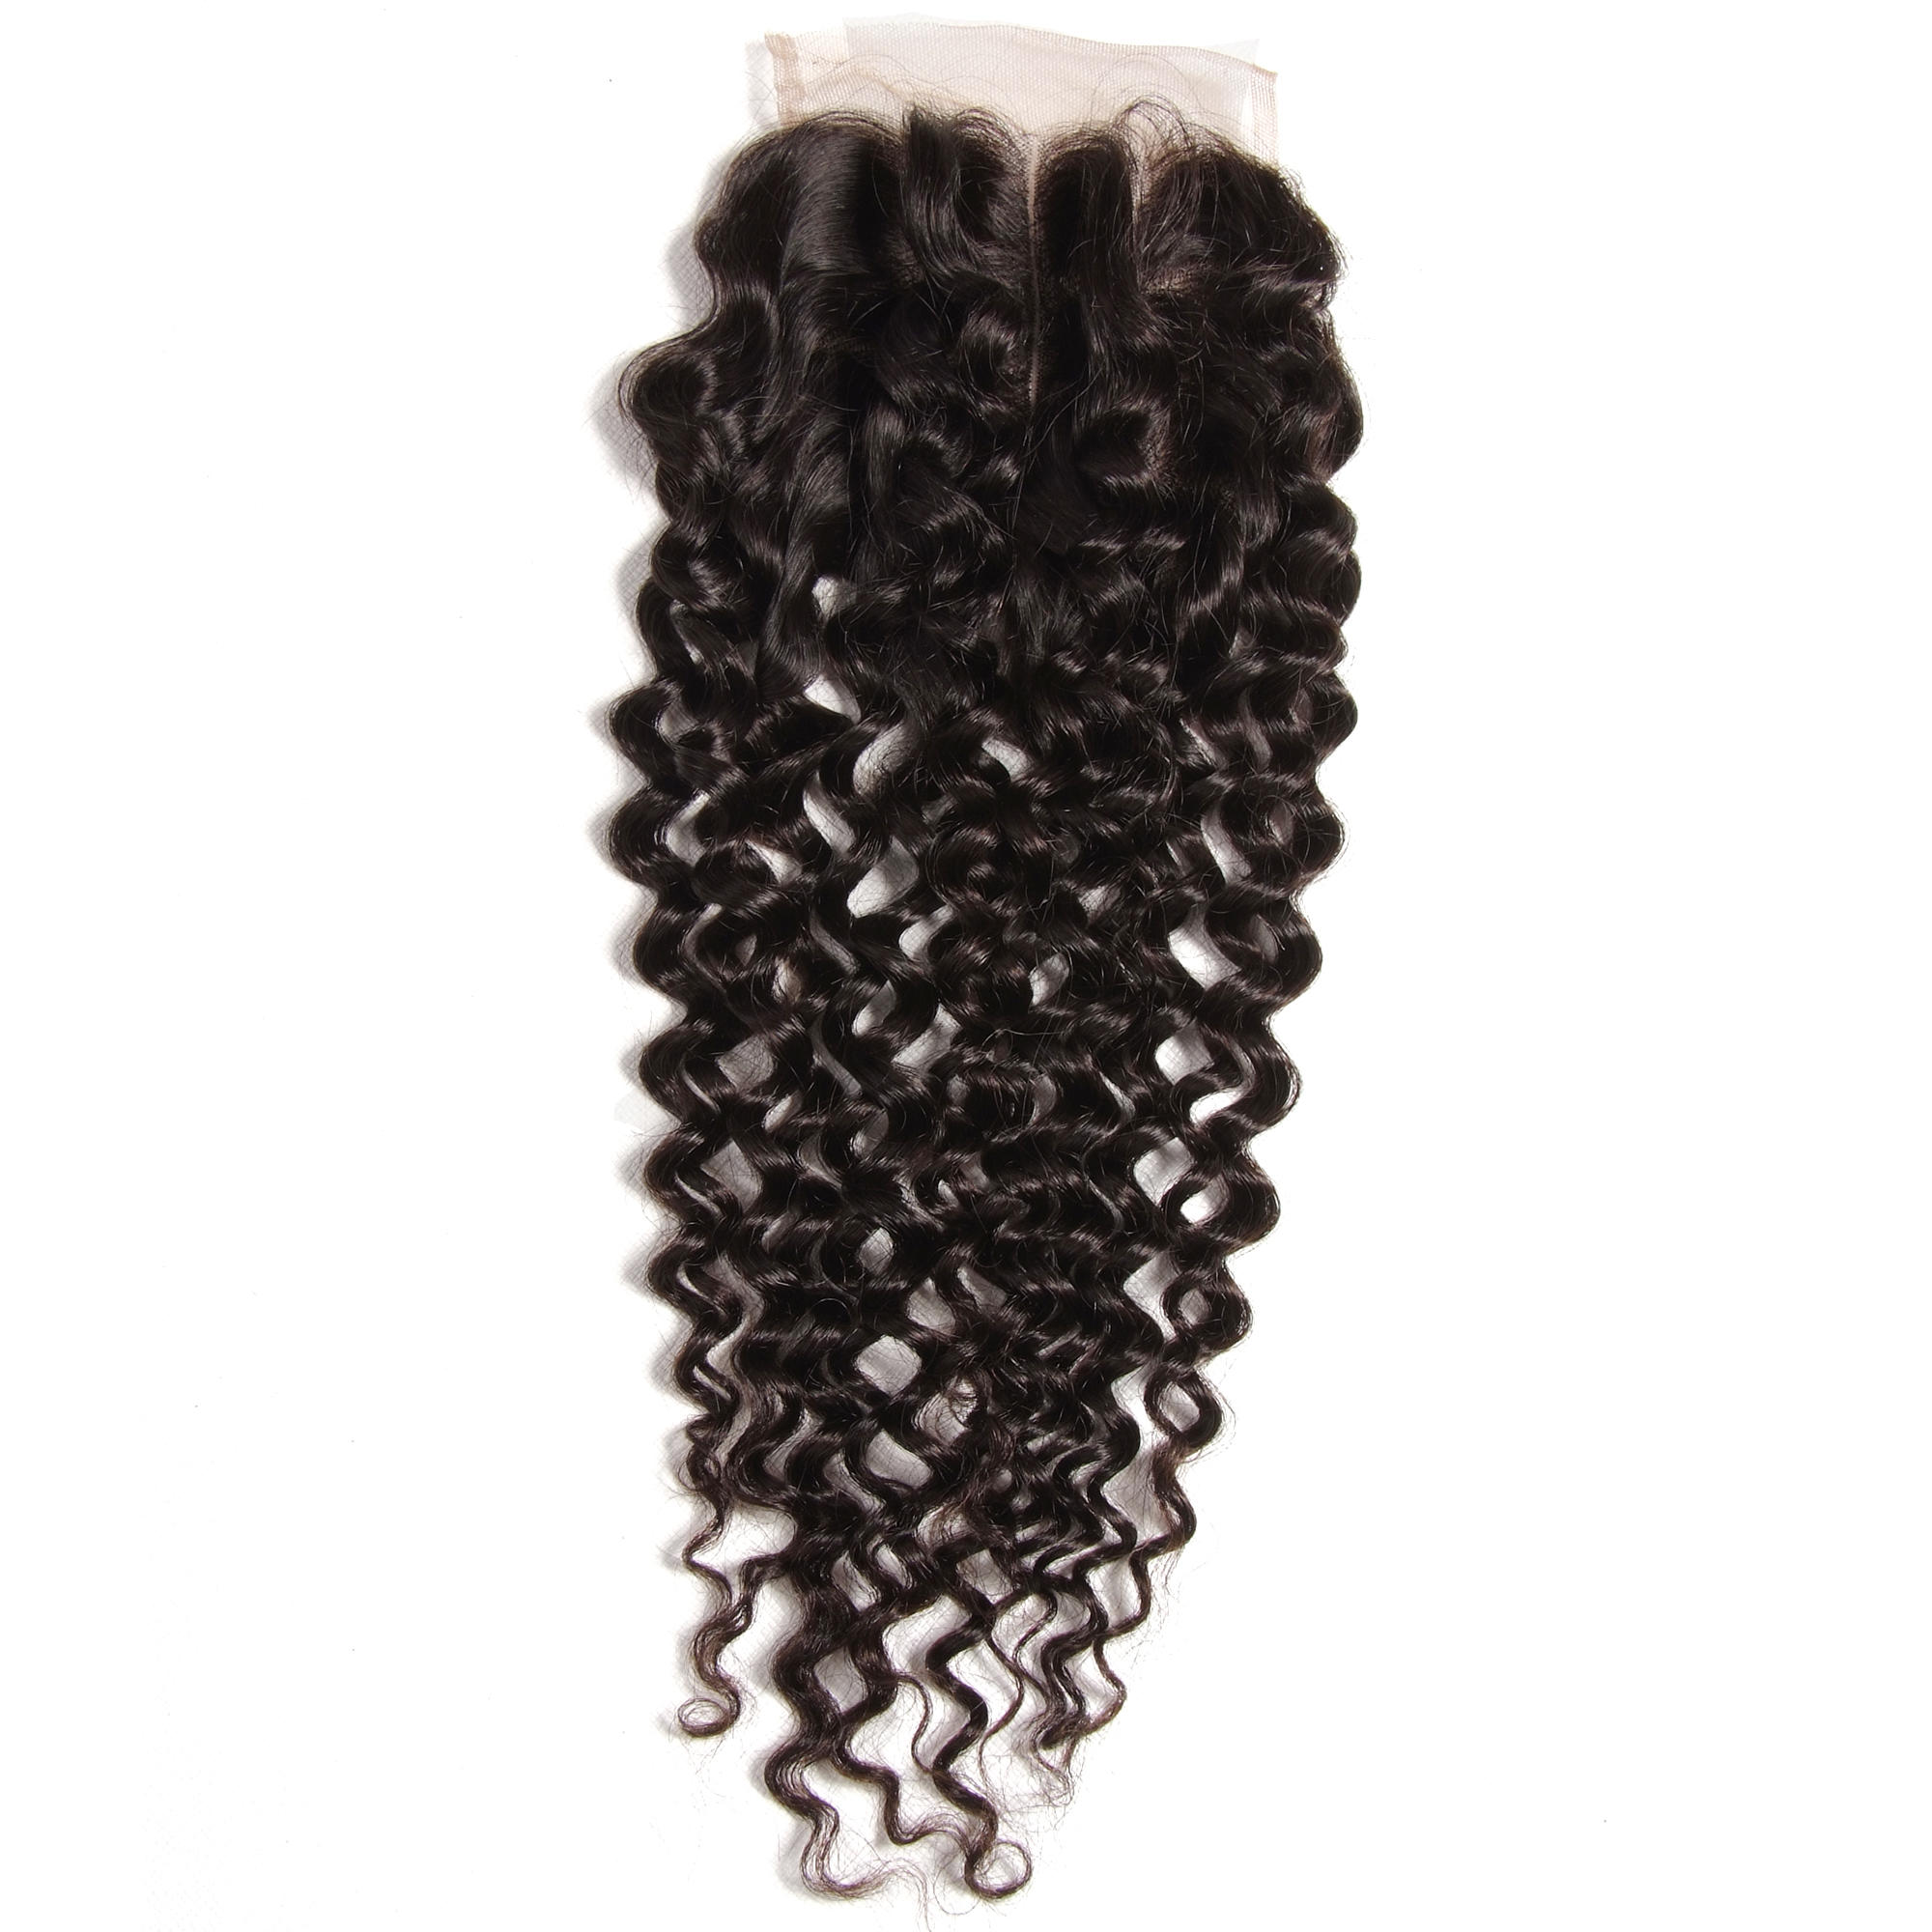 UNice Hair image 36